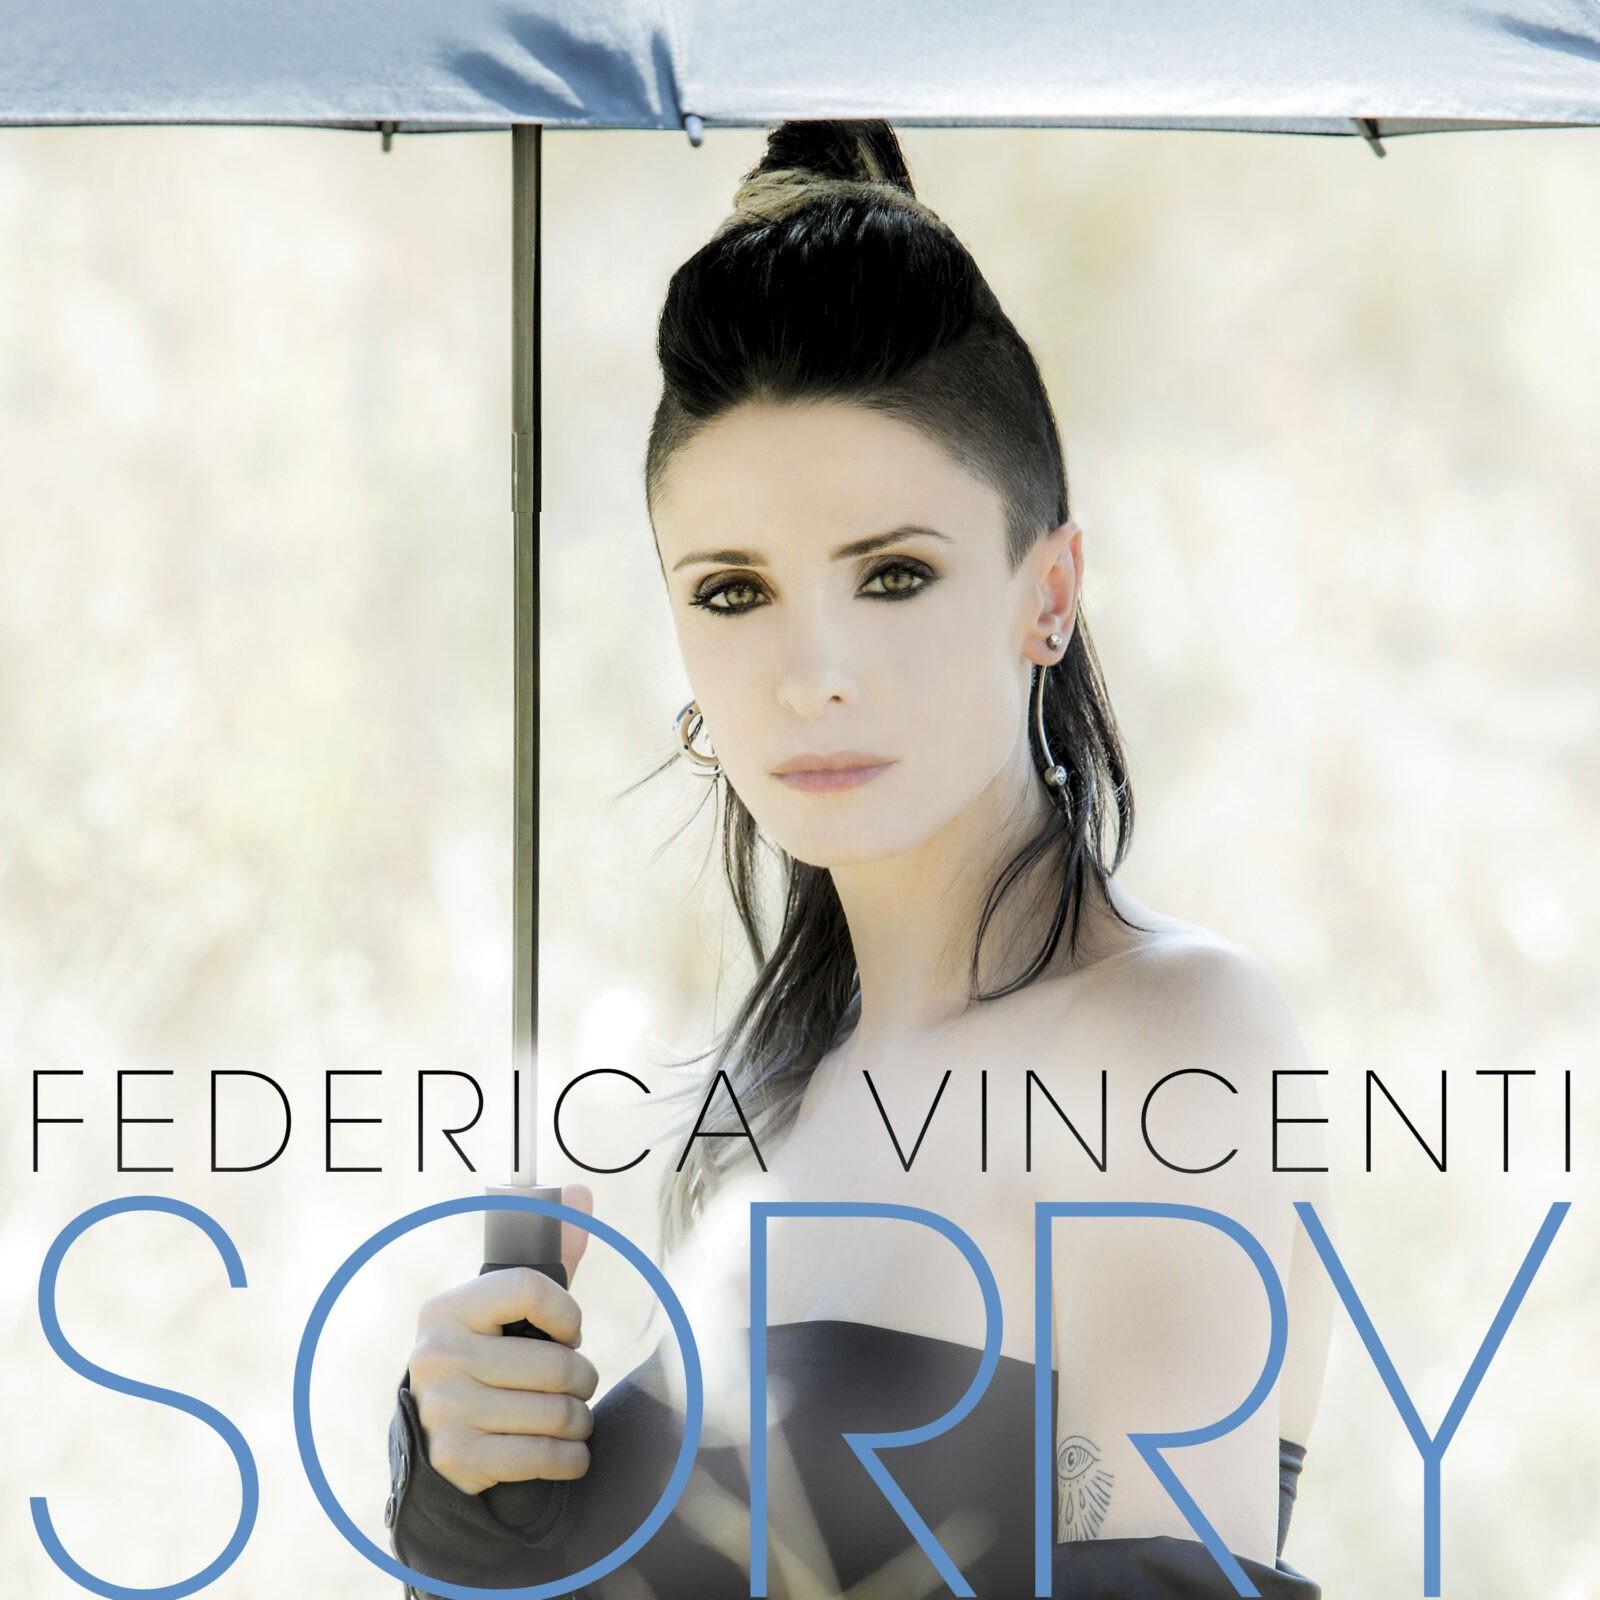 Federica Vincenti Sorry Cover